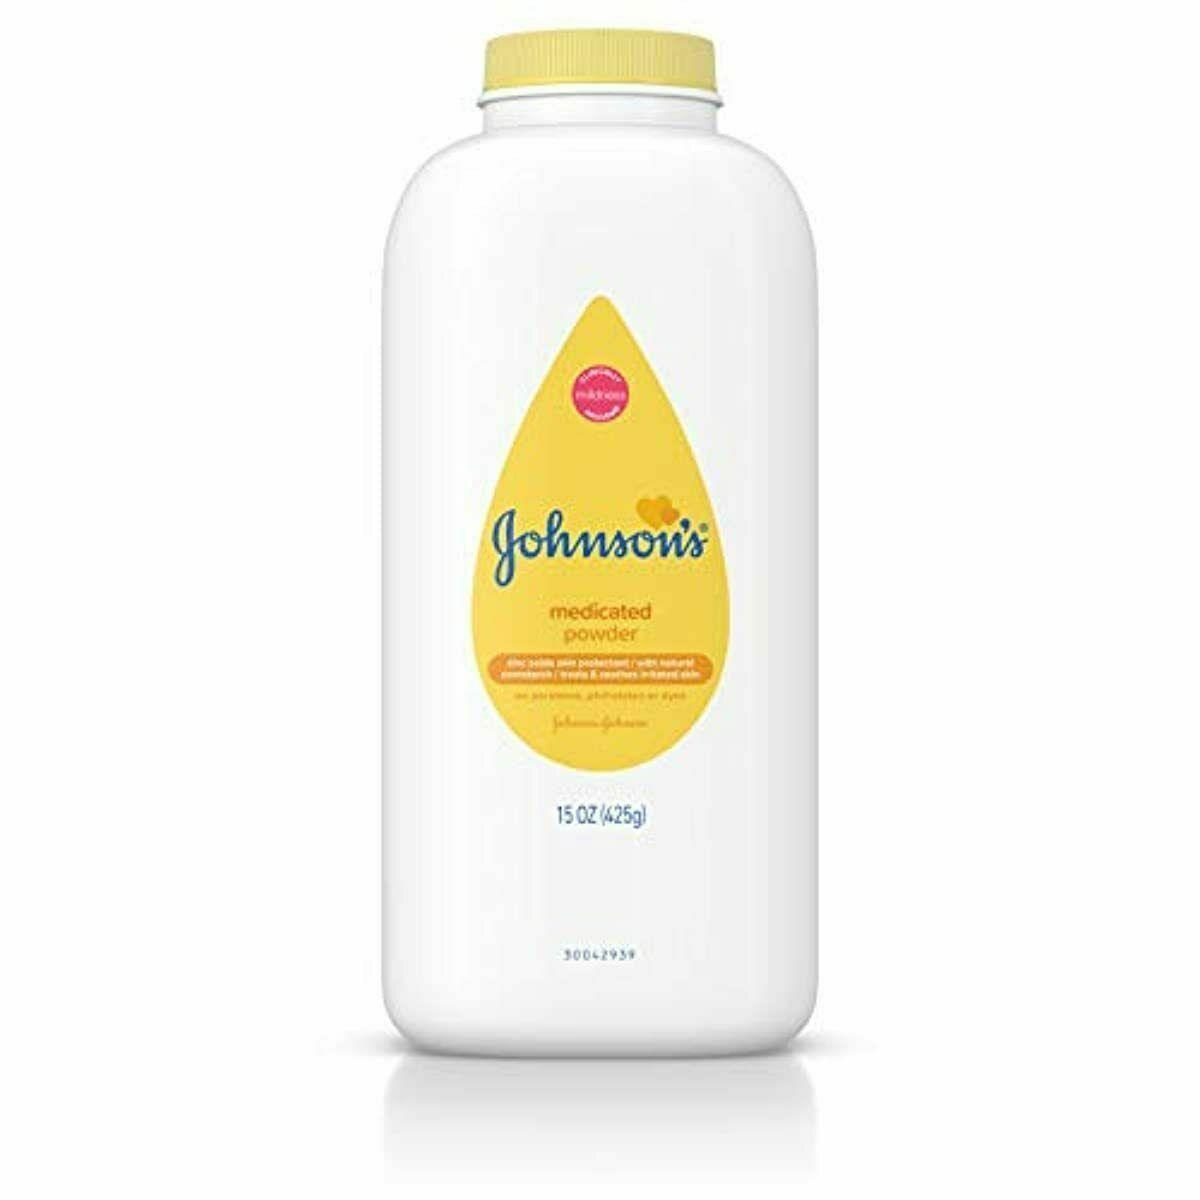 Johnson's Baby Powder, Medicated, 15 oz